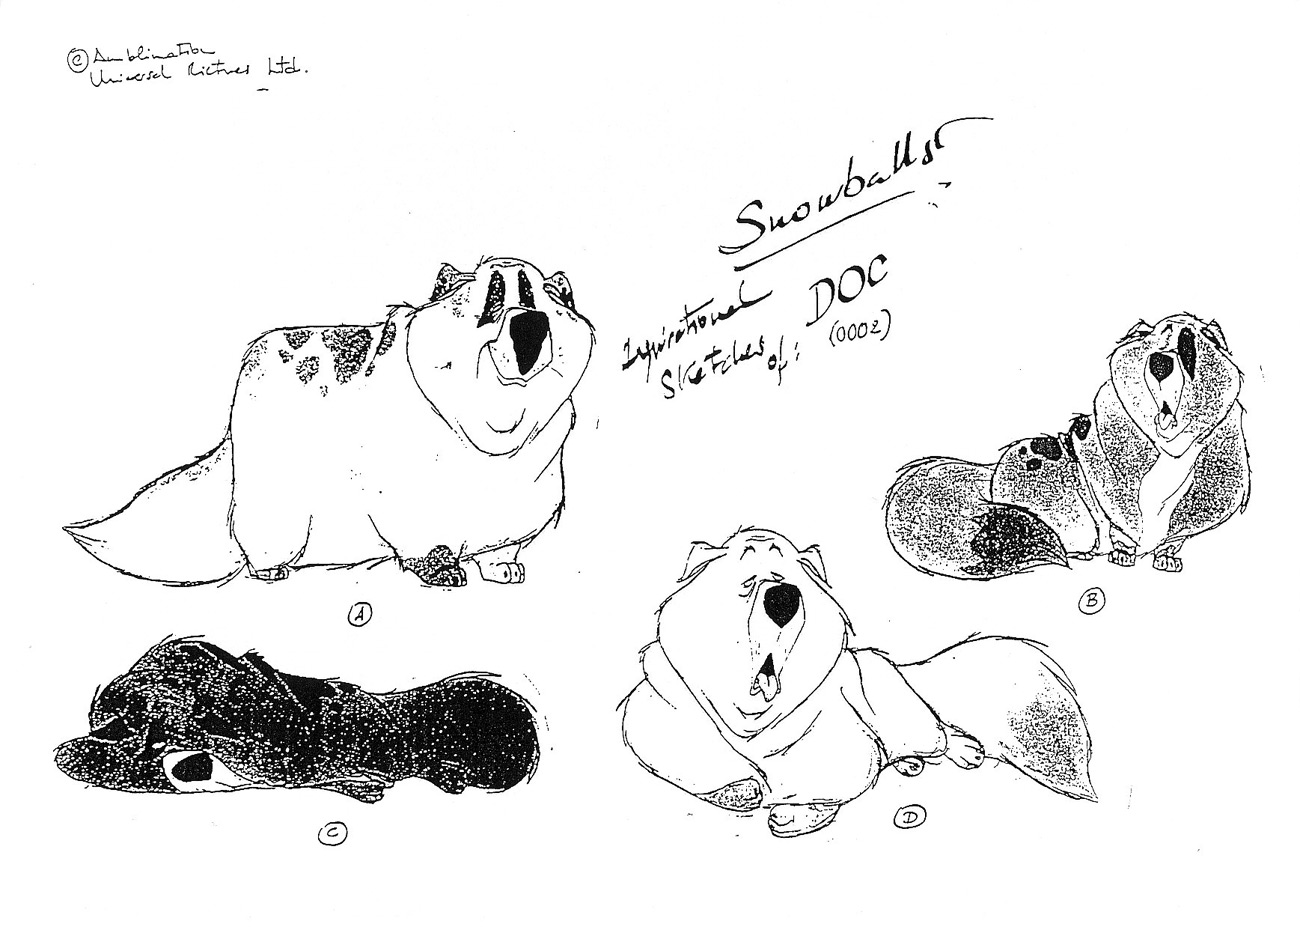 Cartoon Character Design Concept : Cartoon concept design character balto part